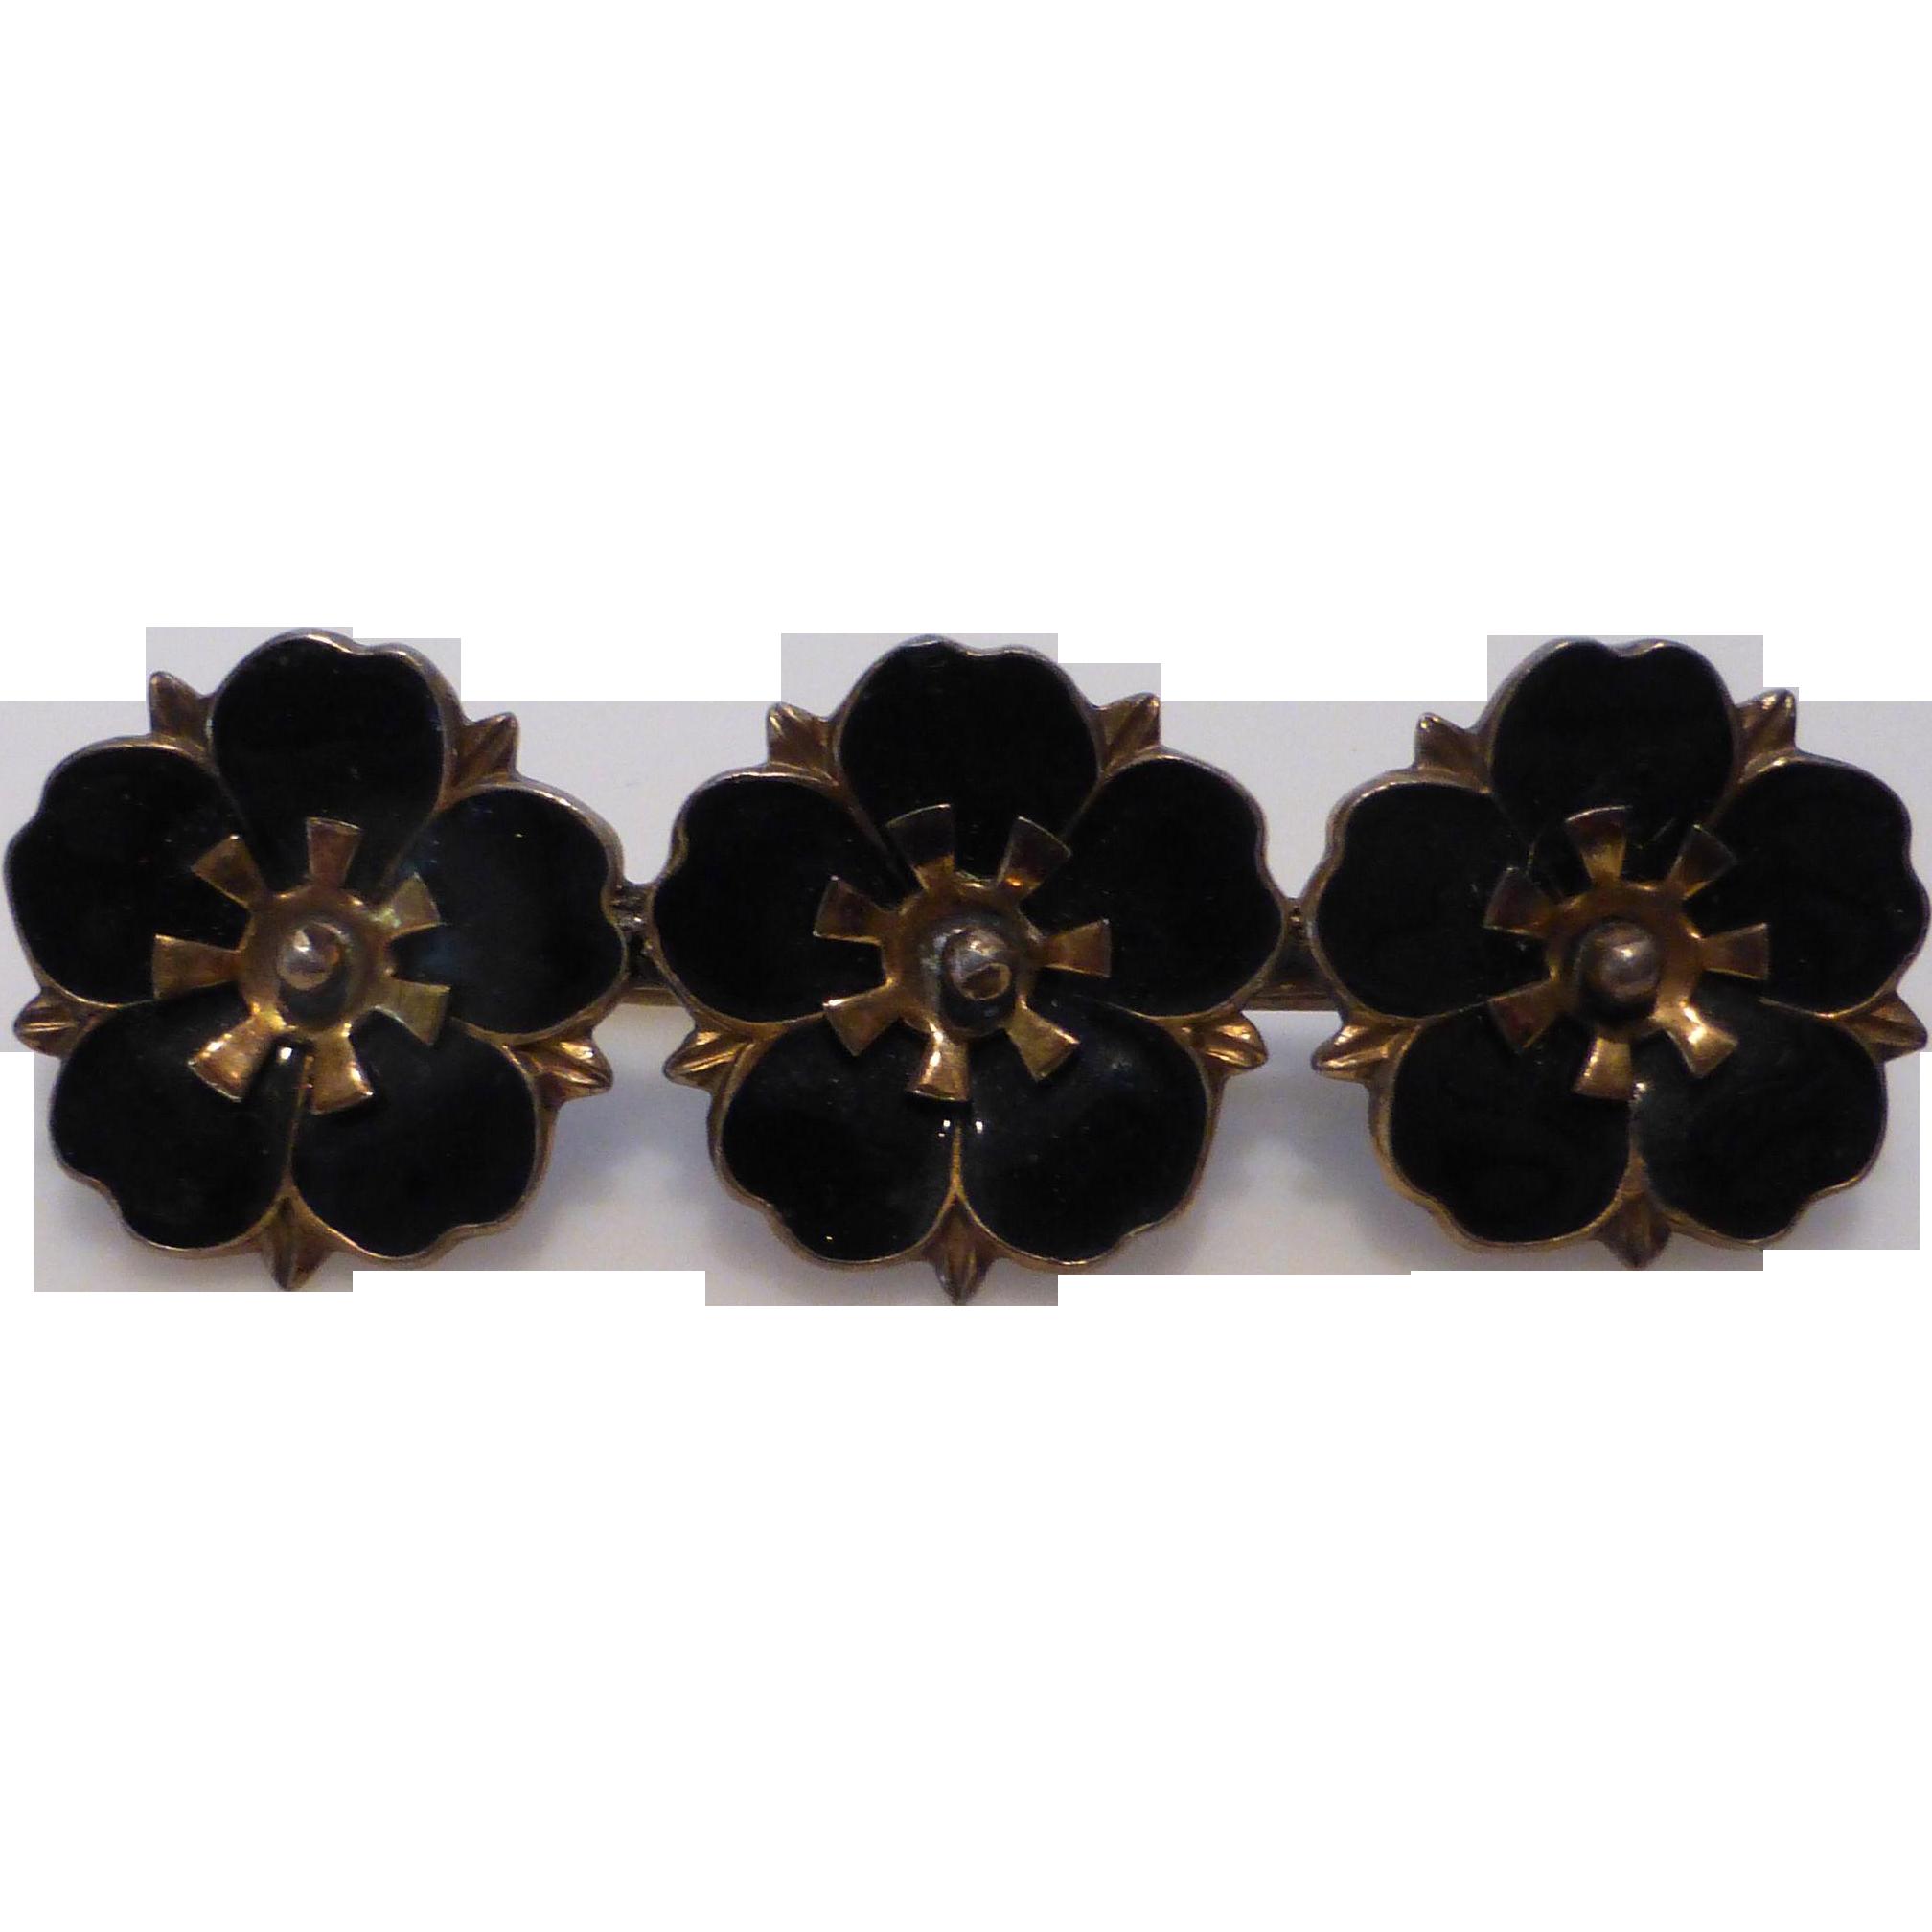 Vintage Aksel Holmsen Enameled Pansy Flower Pin - Circa 1940s Norway Sterling Silver Vermeil